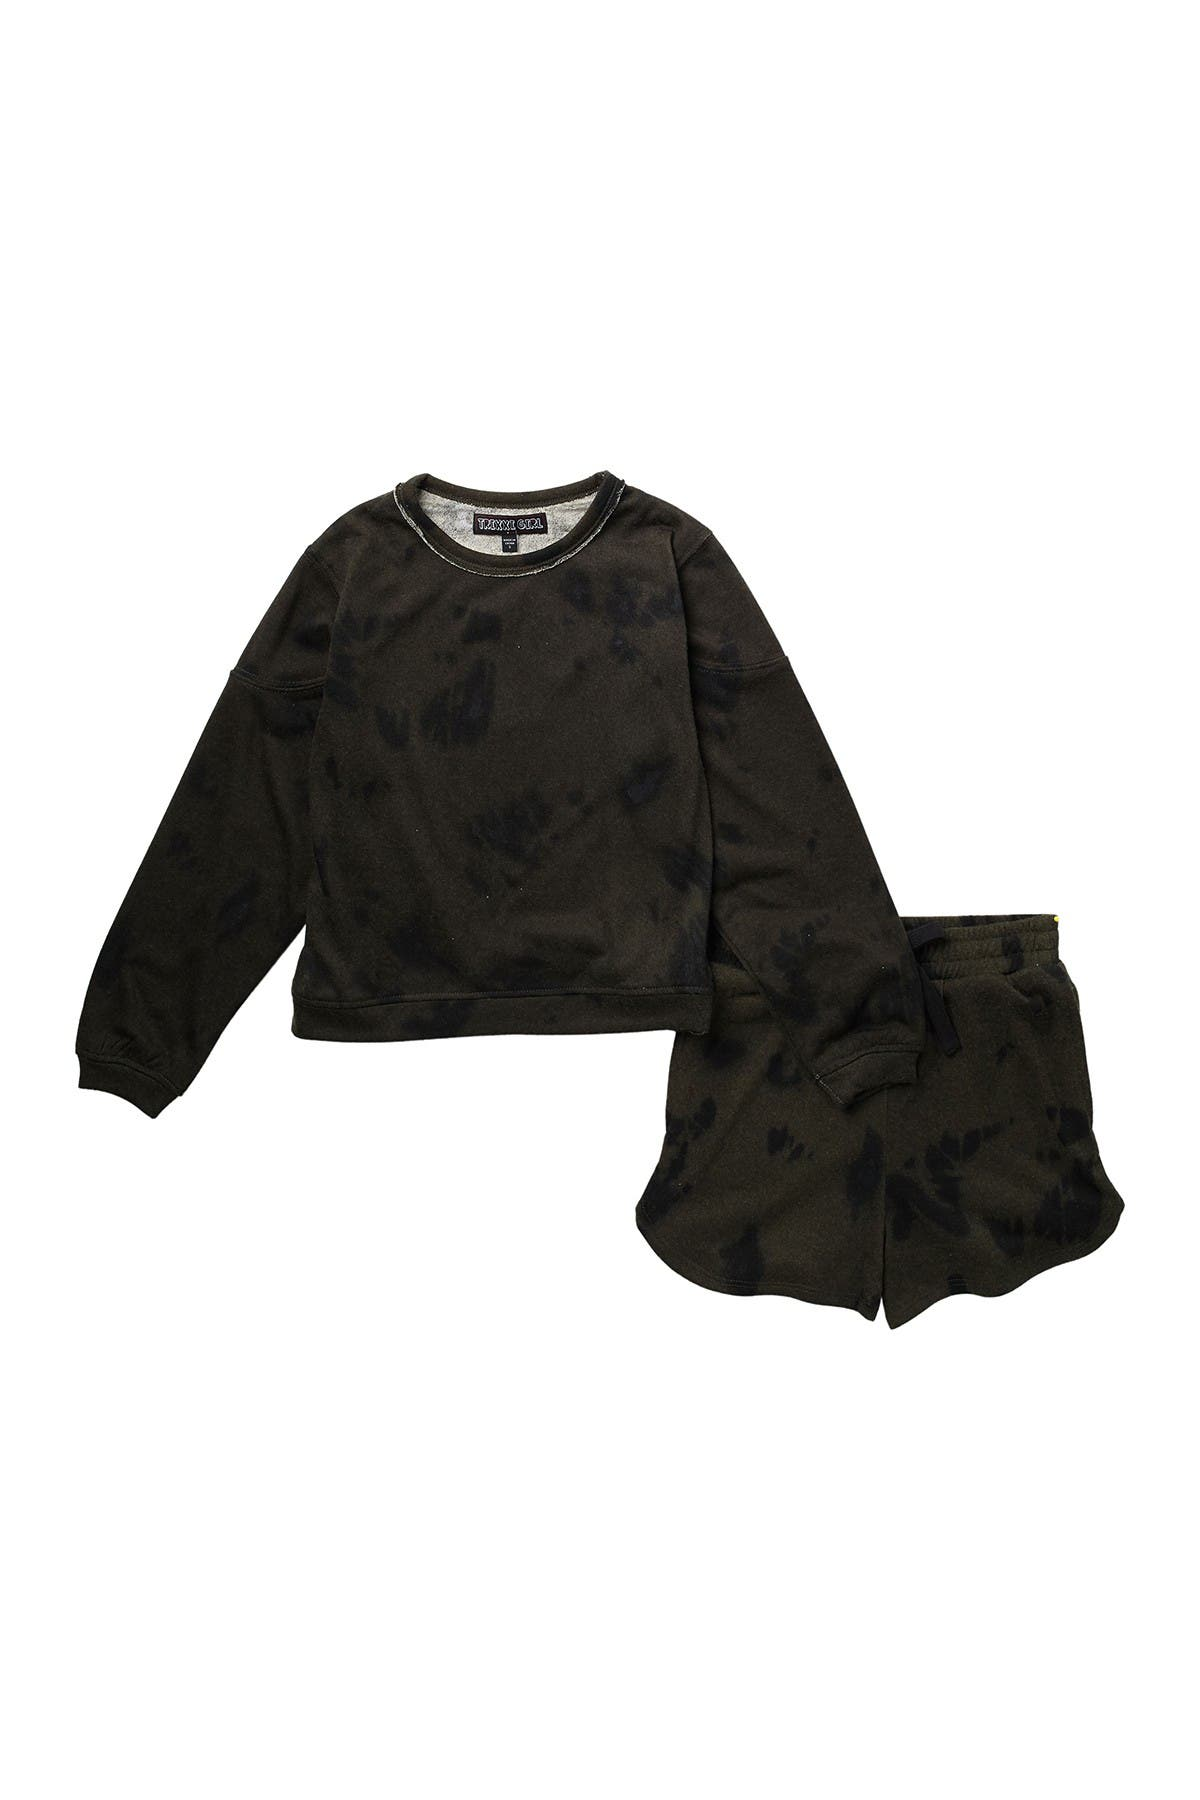 Image of Trixxi French Terry Print Sweatshirt & Shorts 2-Piece Set